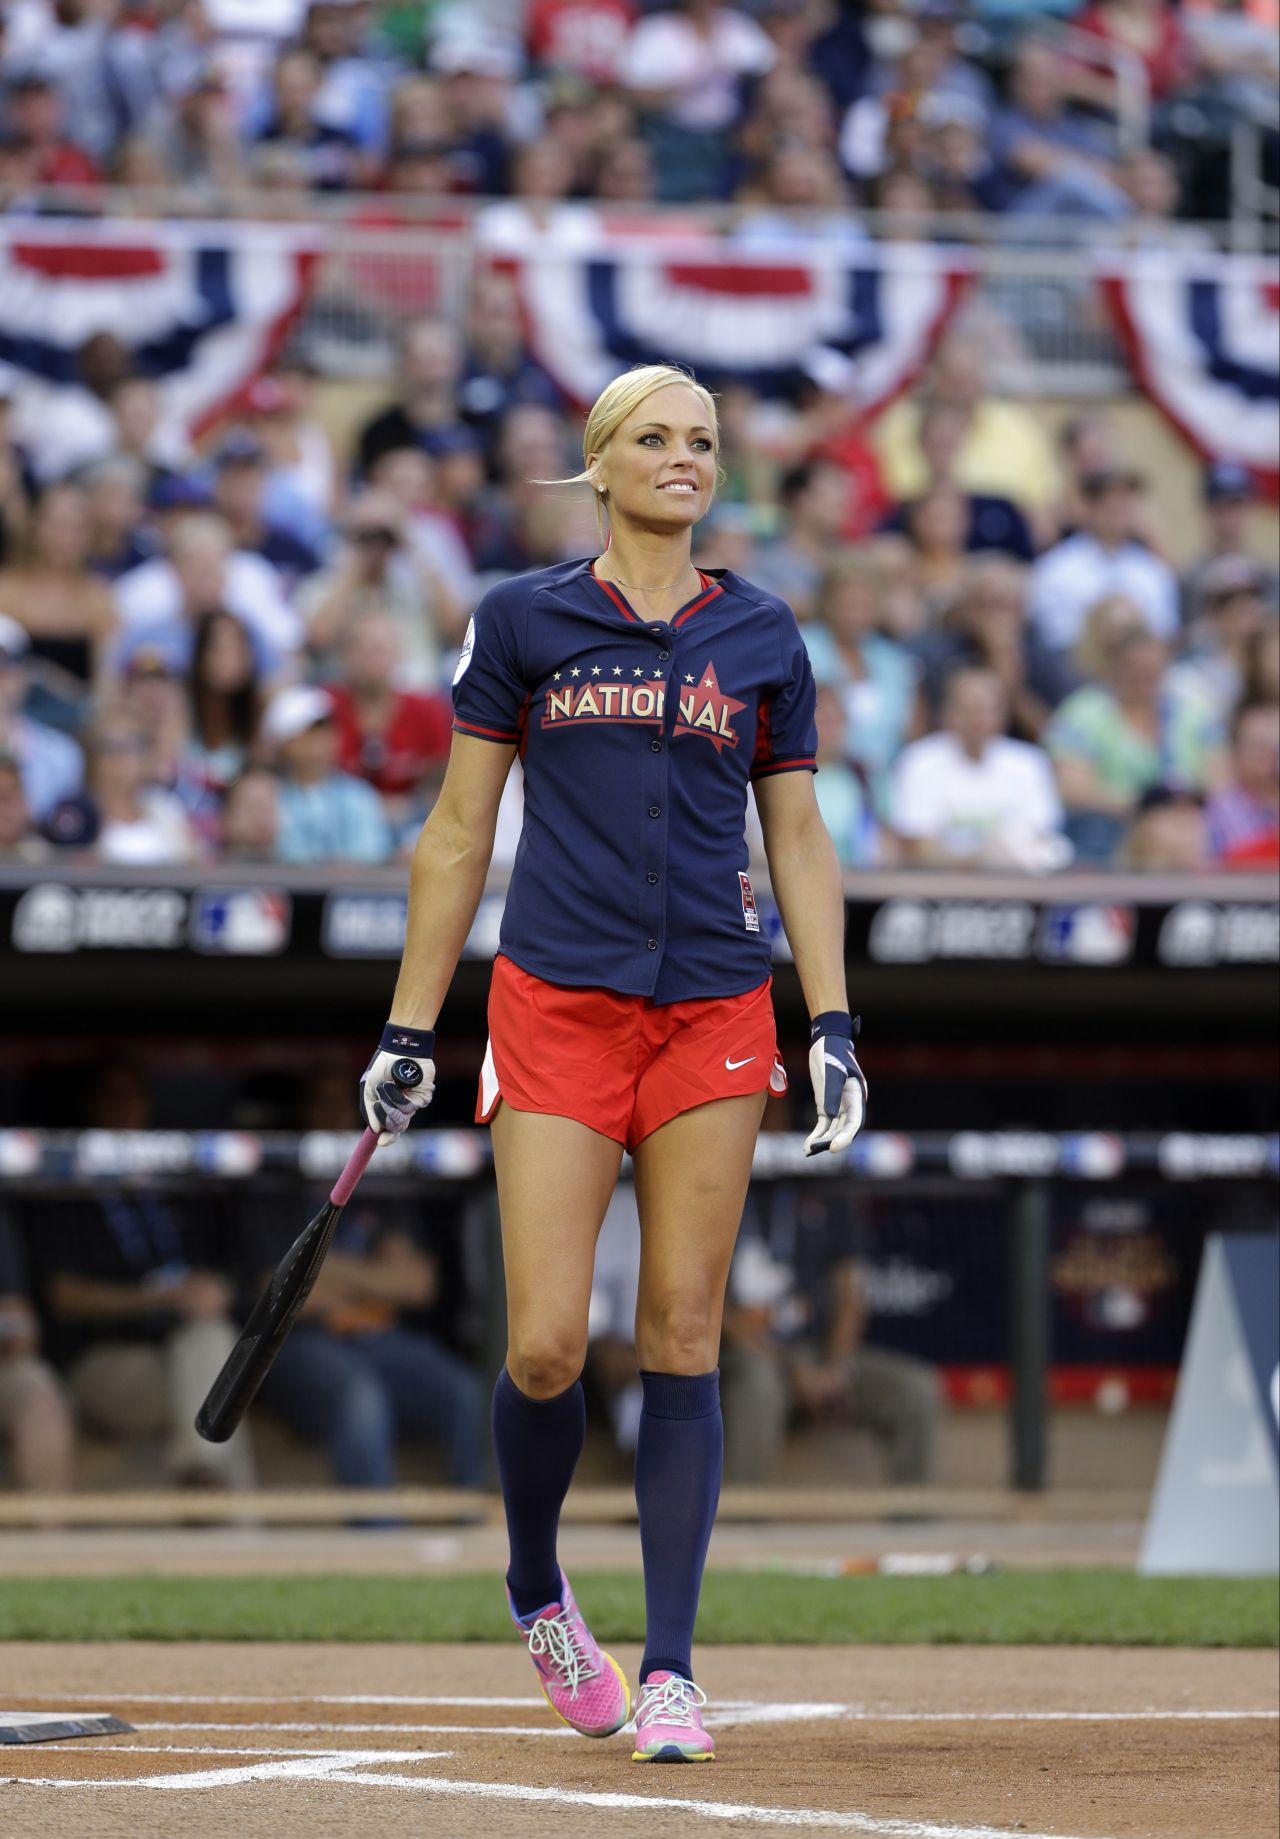 2019 celebrity softball game videos